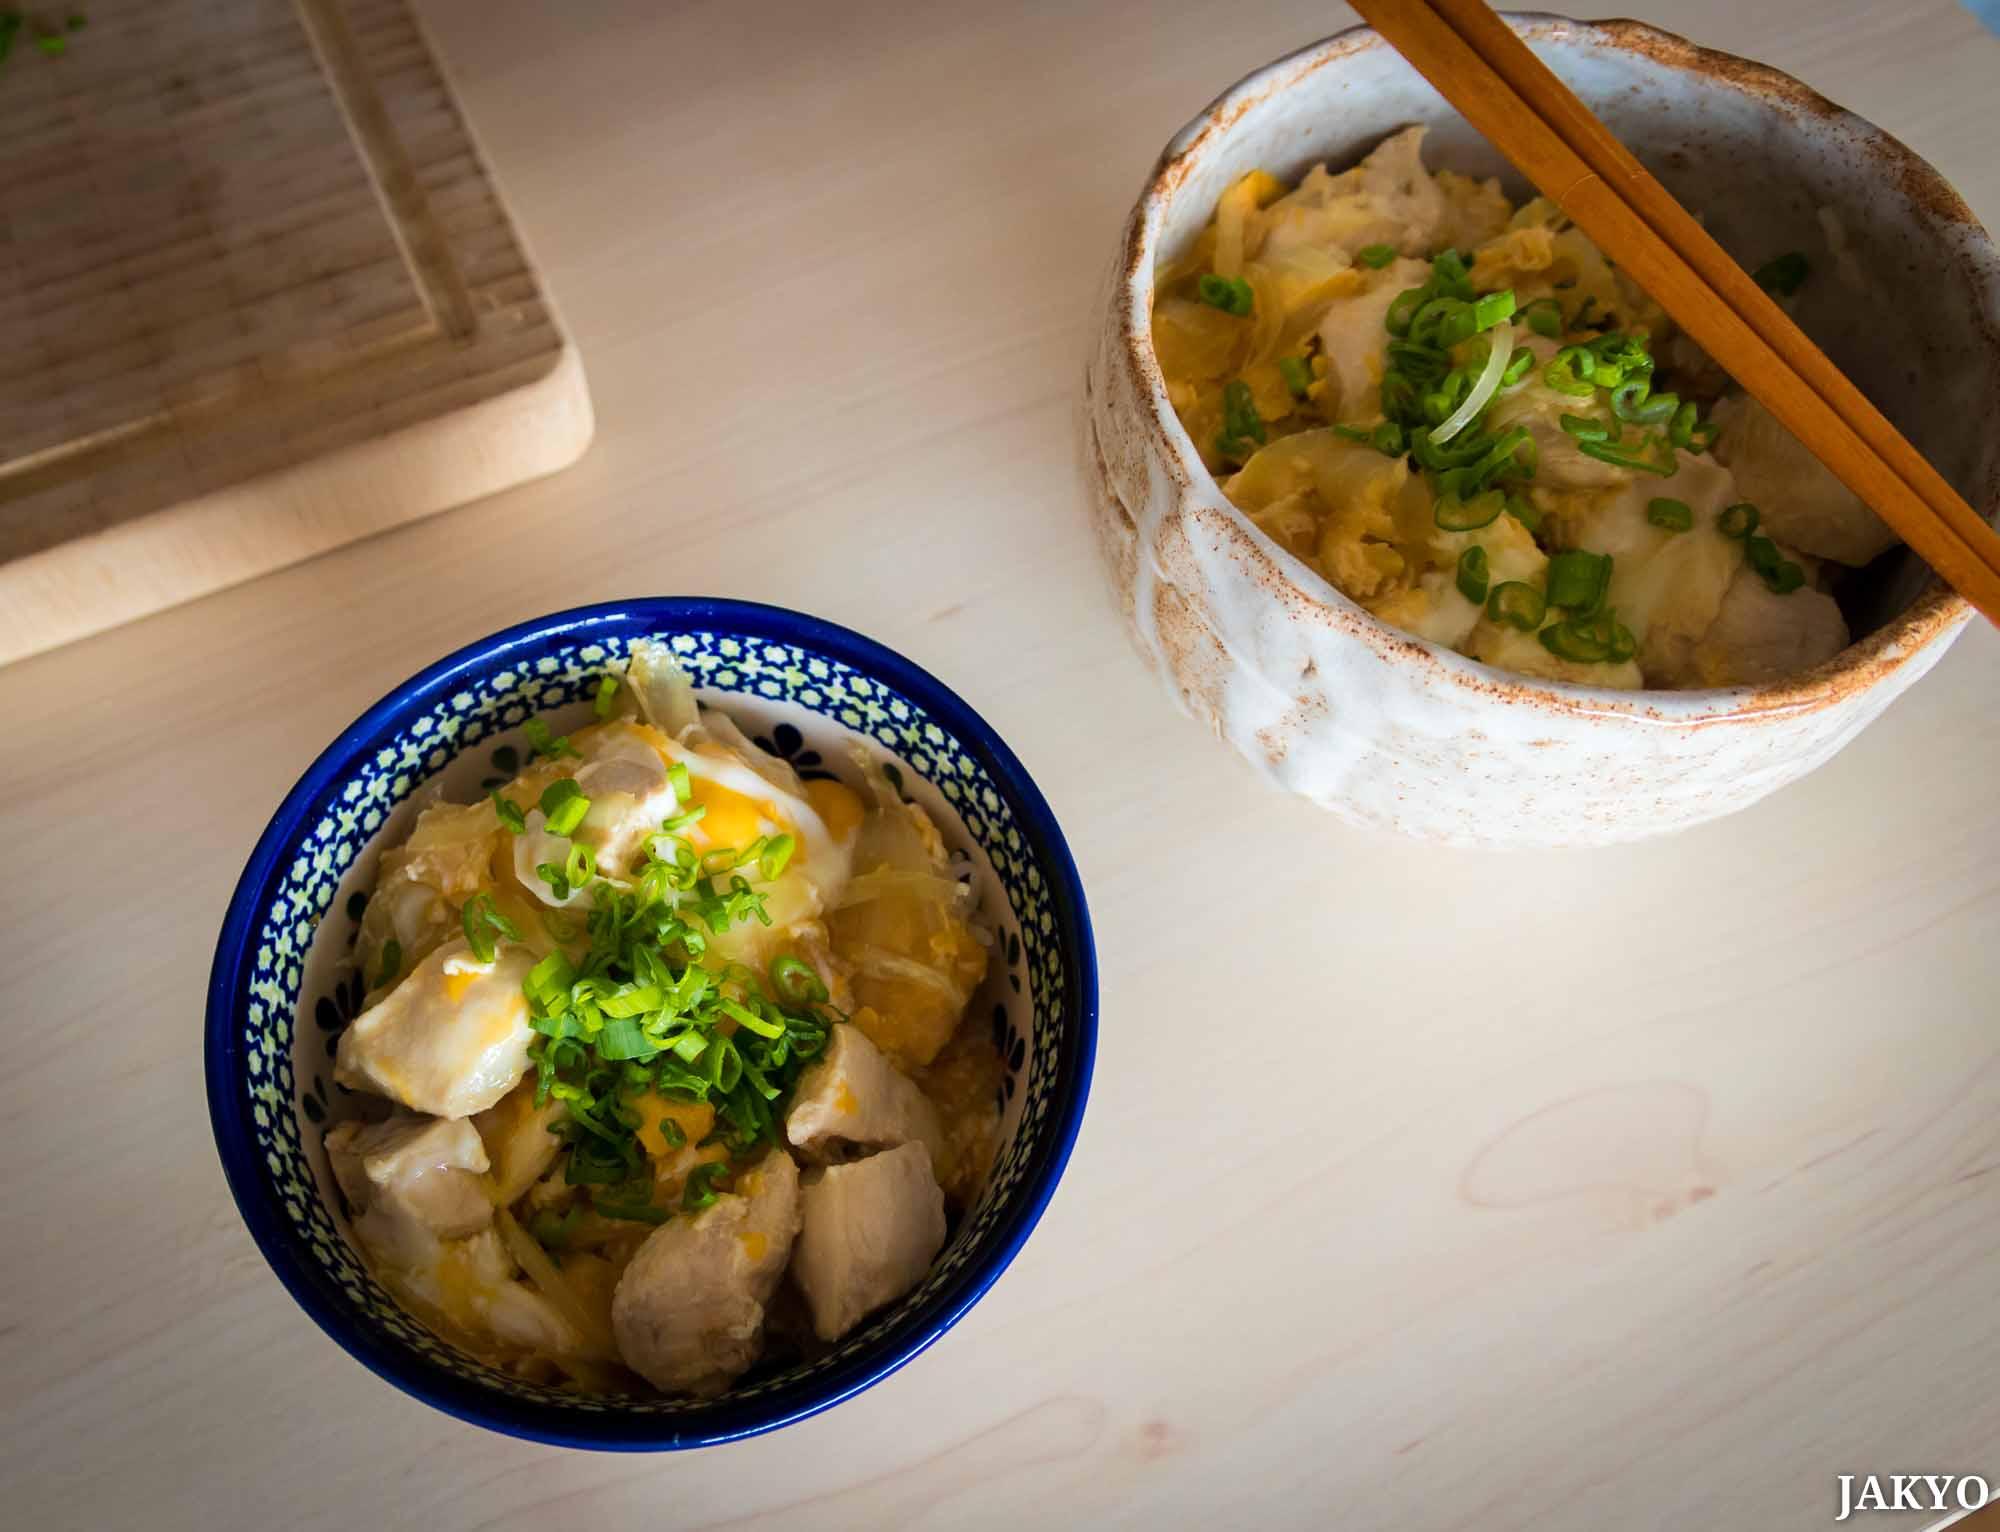 Oyakodon Zubereitung Kochen / Donburi, Essen, Food, Japanese Food, Japanisches Essen, Oyakodon, どんぶり, 丼, 和食, 料理, 日本料理, 親子丼, 食べ物